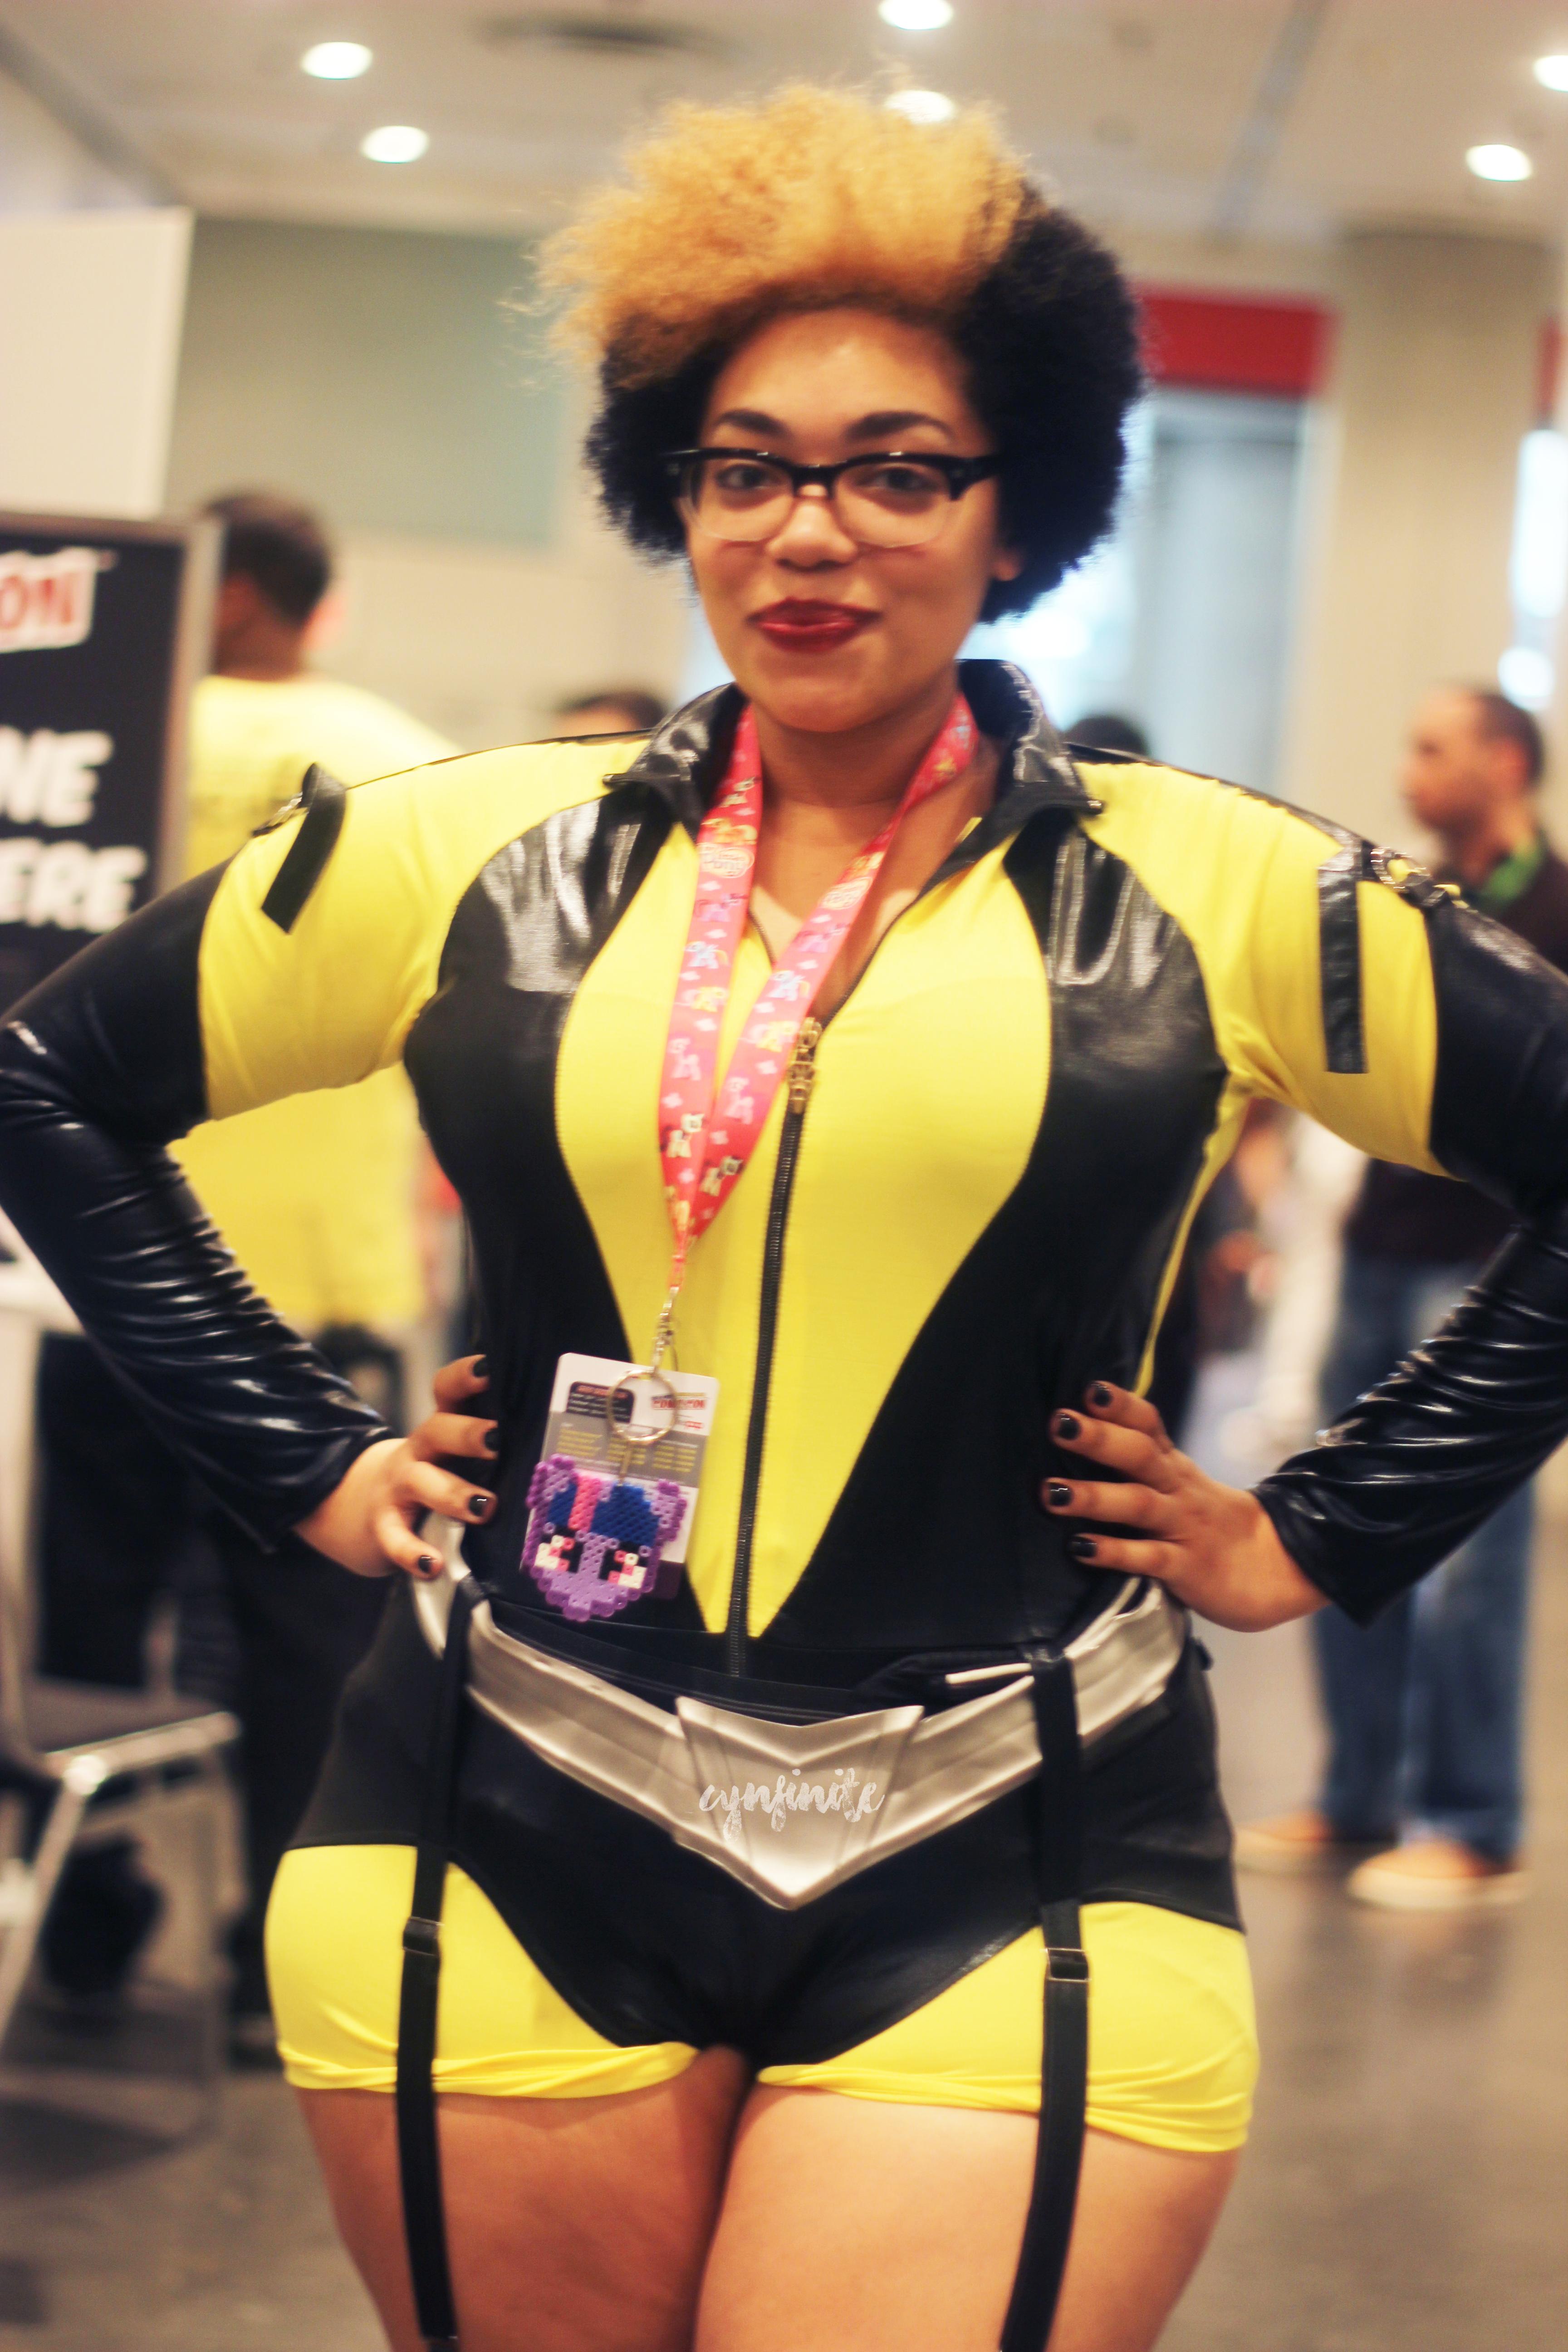 comiccon9 - black girl nerds